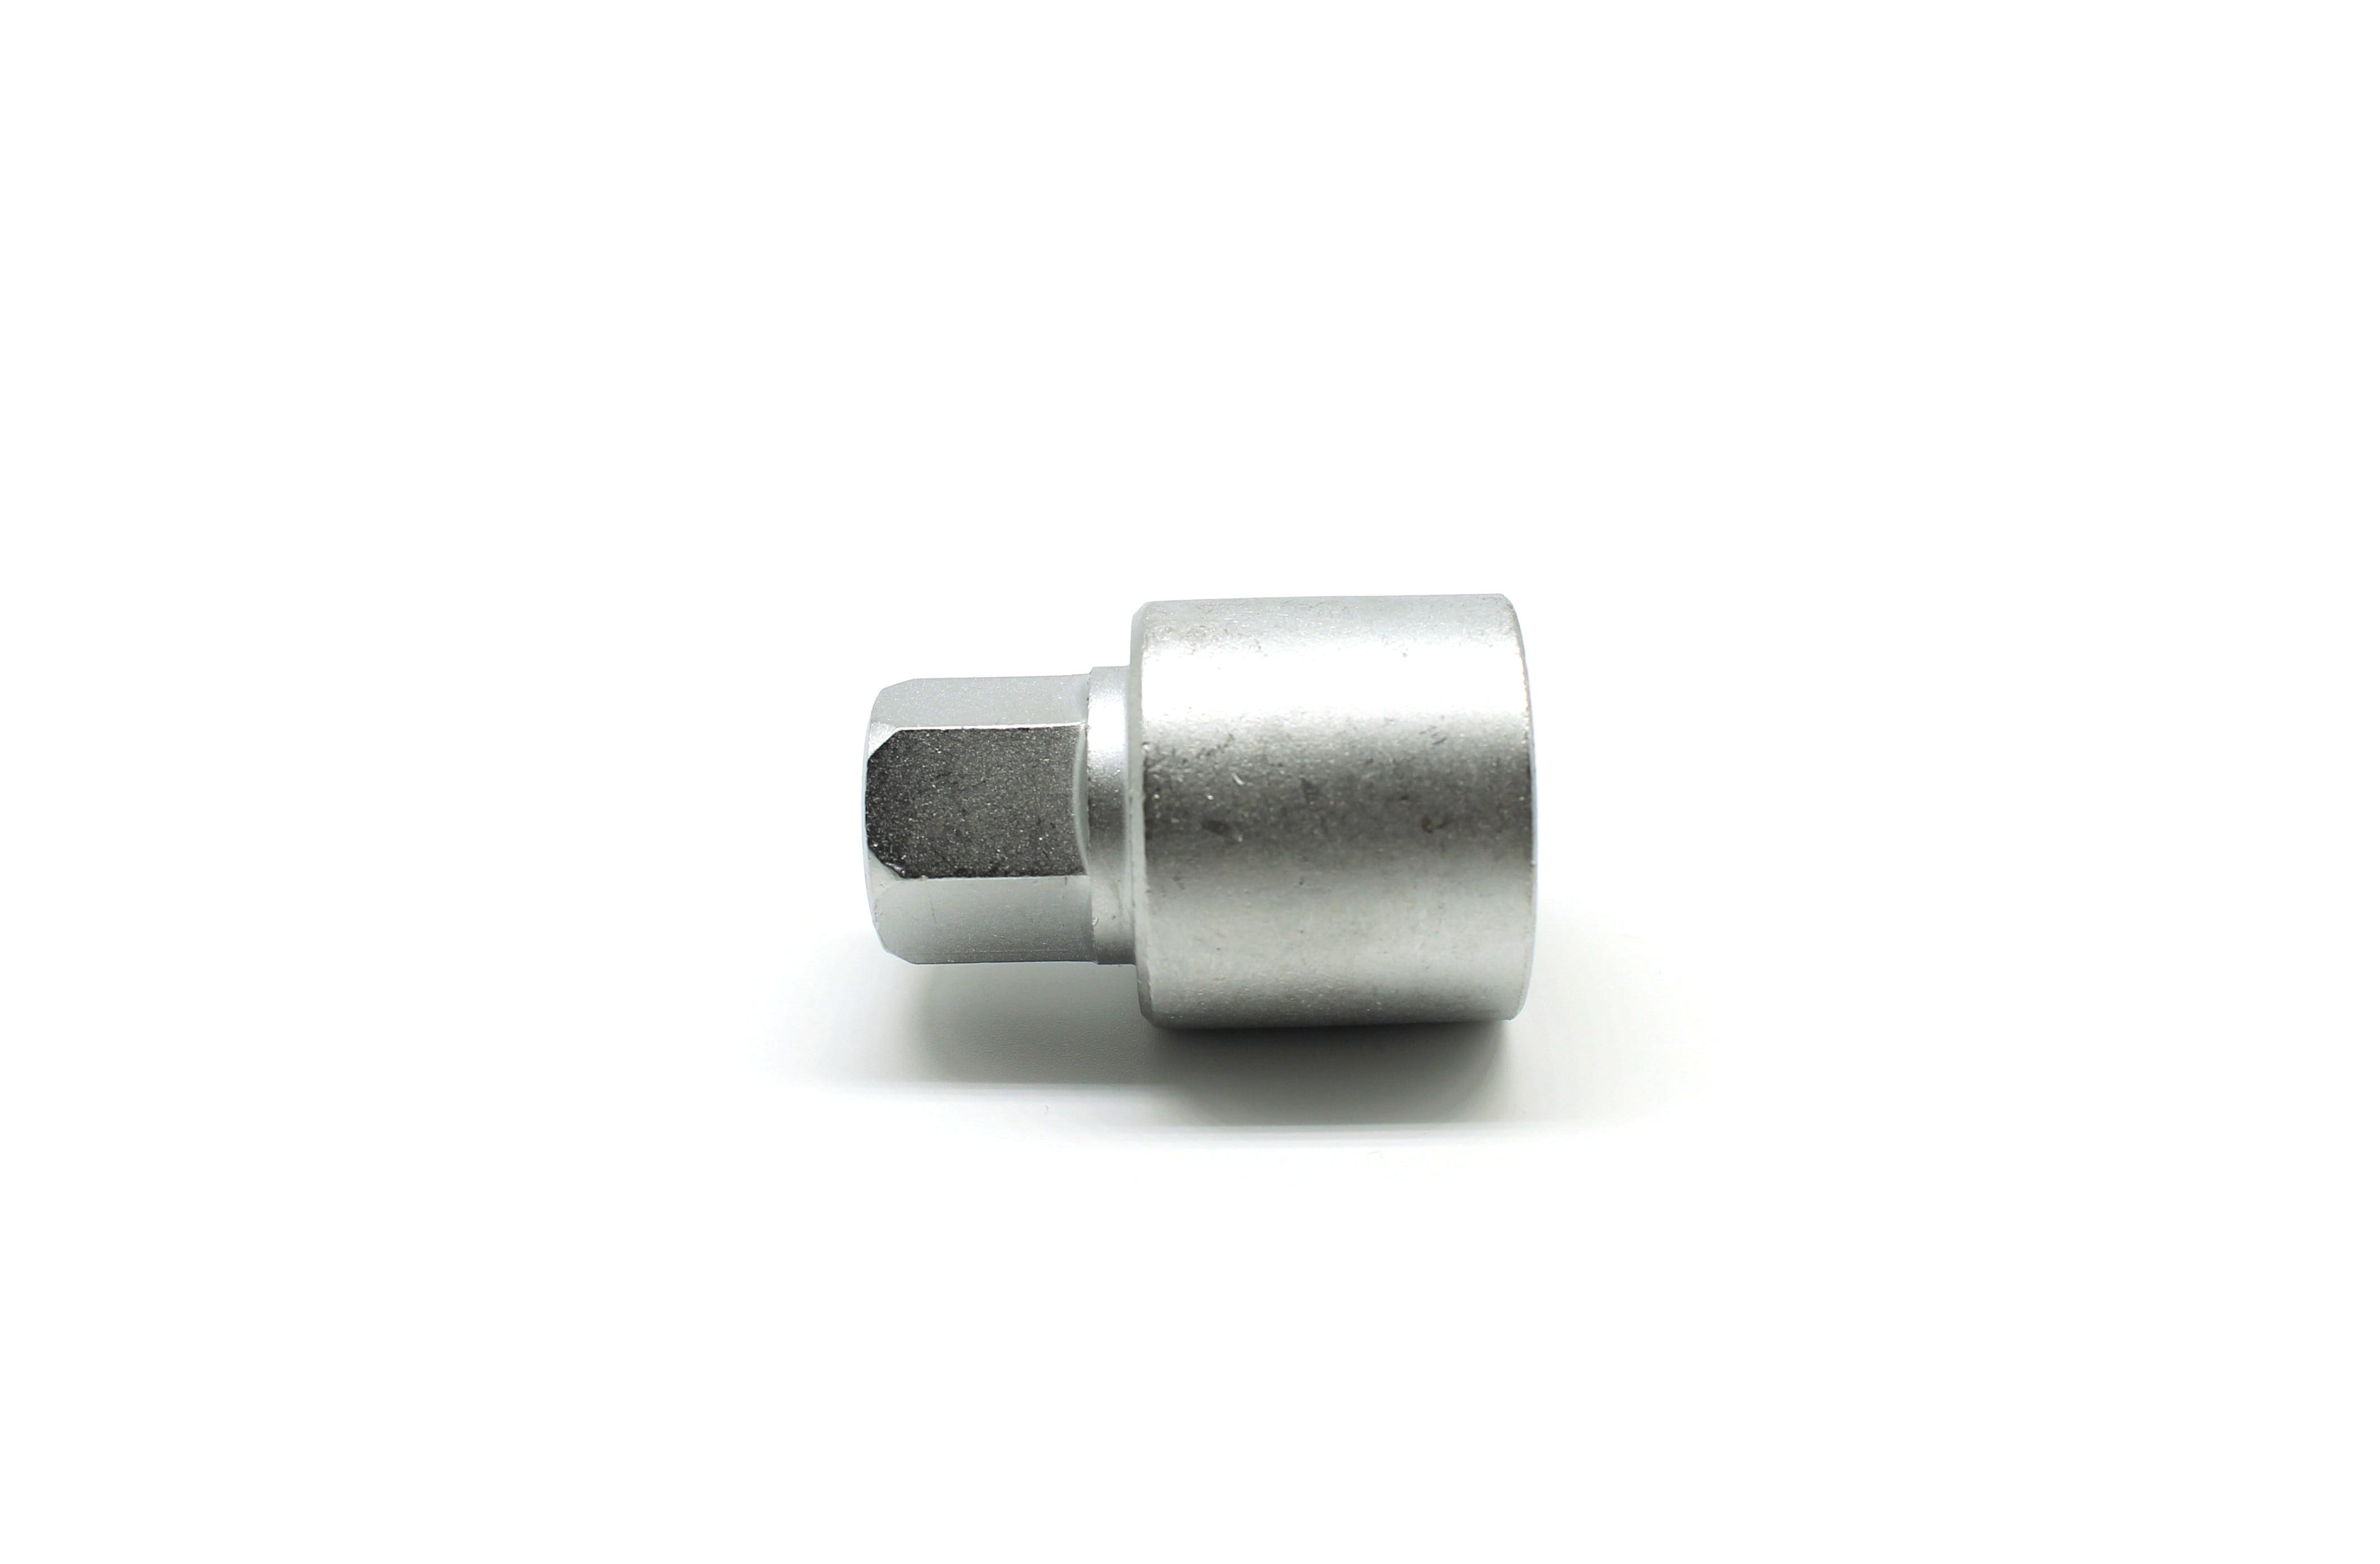 TEMO 521 Wheel Removal Key Anti-theft Lugnut Socket S3056 for VW AUDI VAG